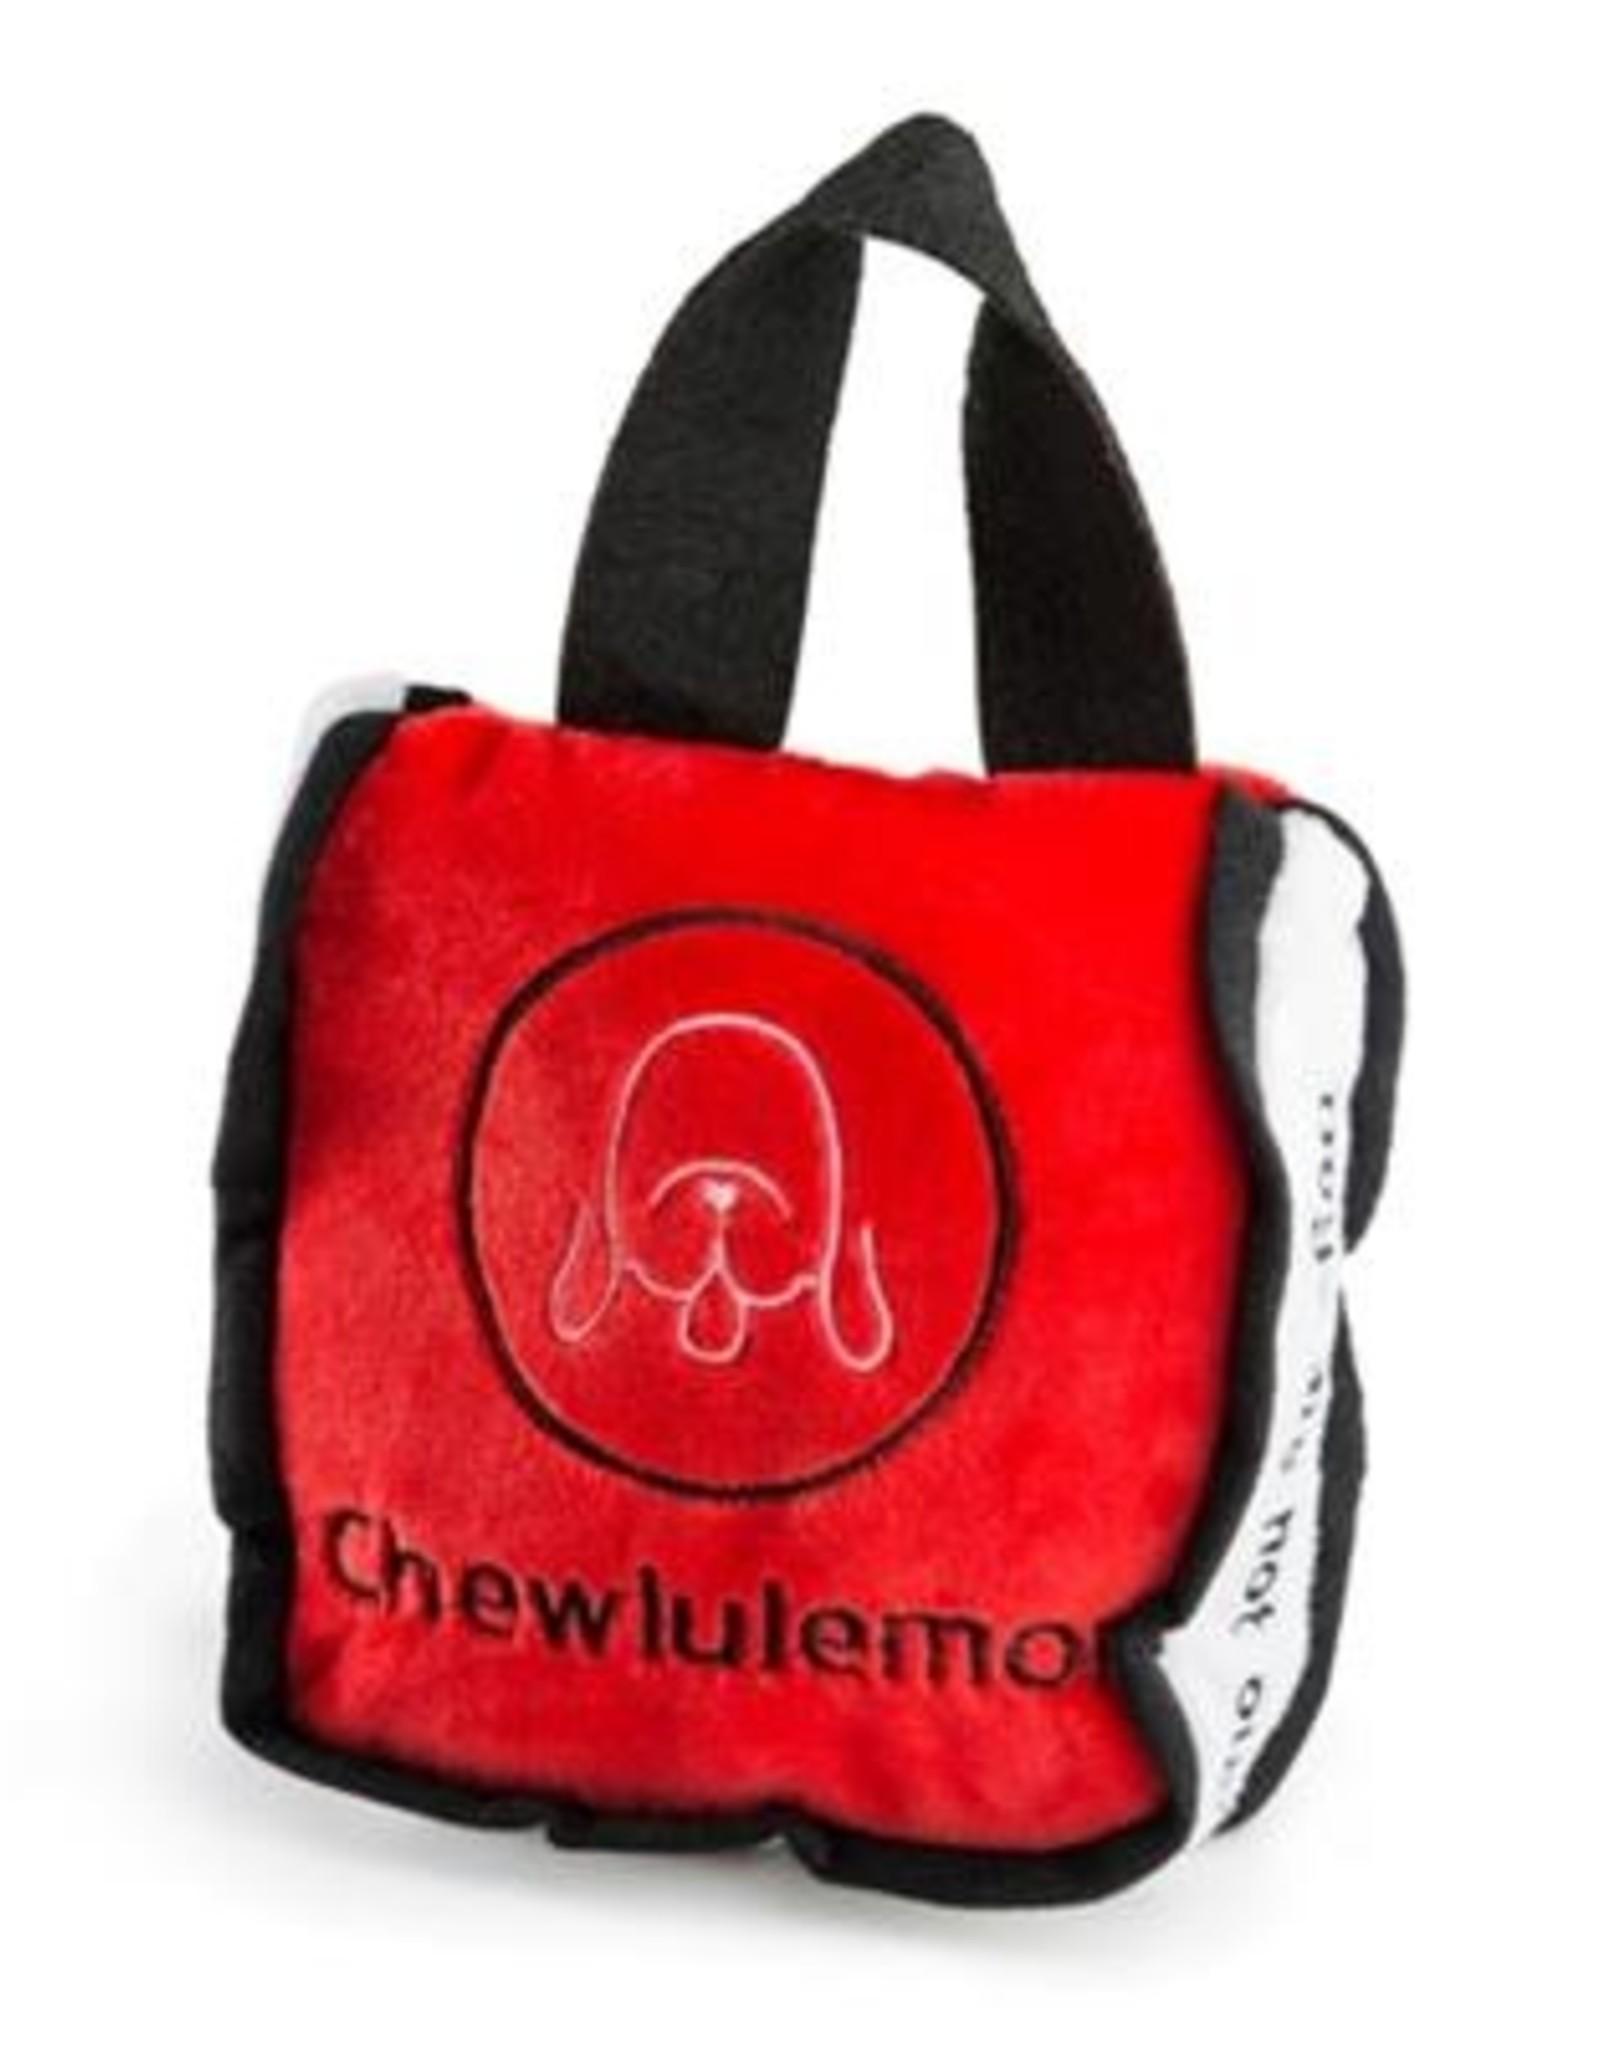 Haute Diggity Dog Chewlulemon Tote Bag